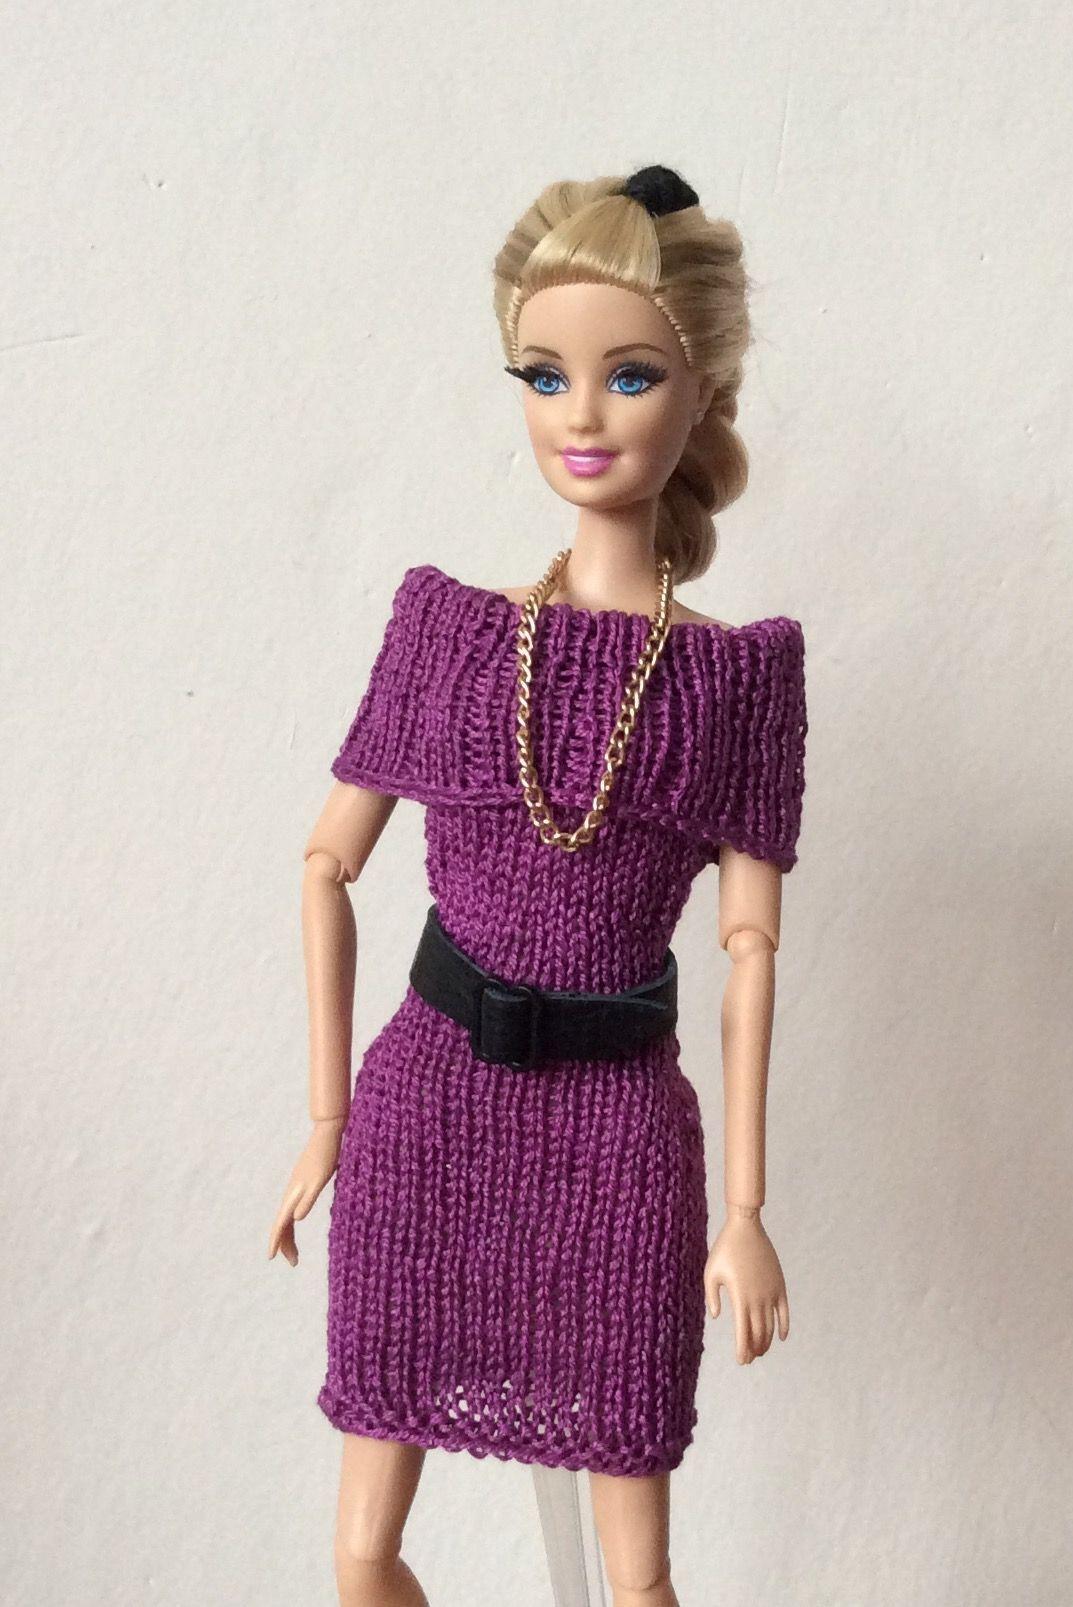 Pin de Hortenza en Poupées | Pinterest | Barbie, Dos agujas y Ropa ...